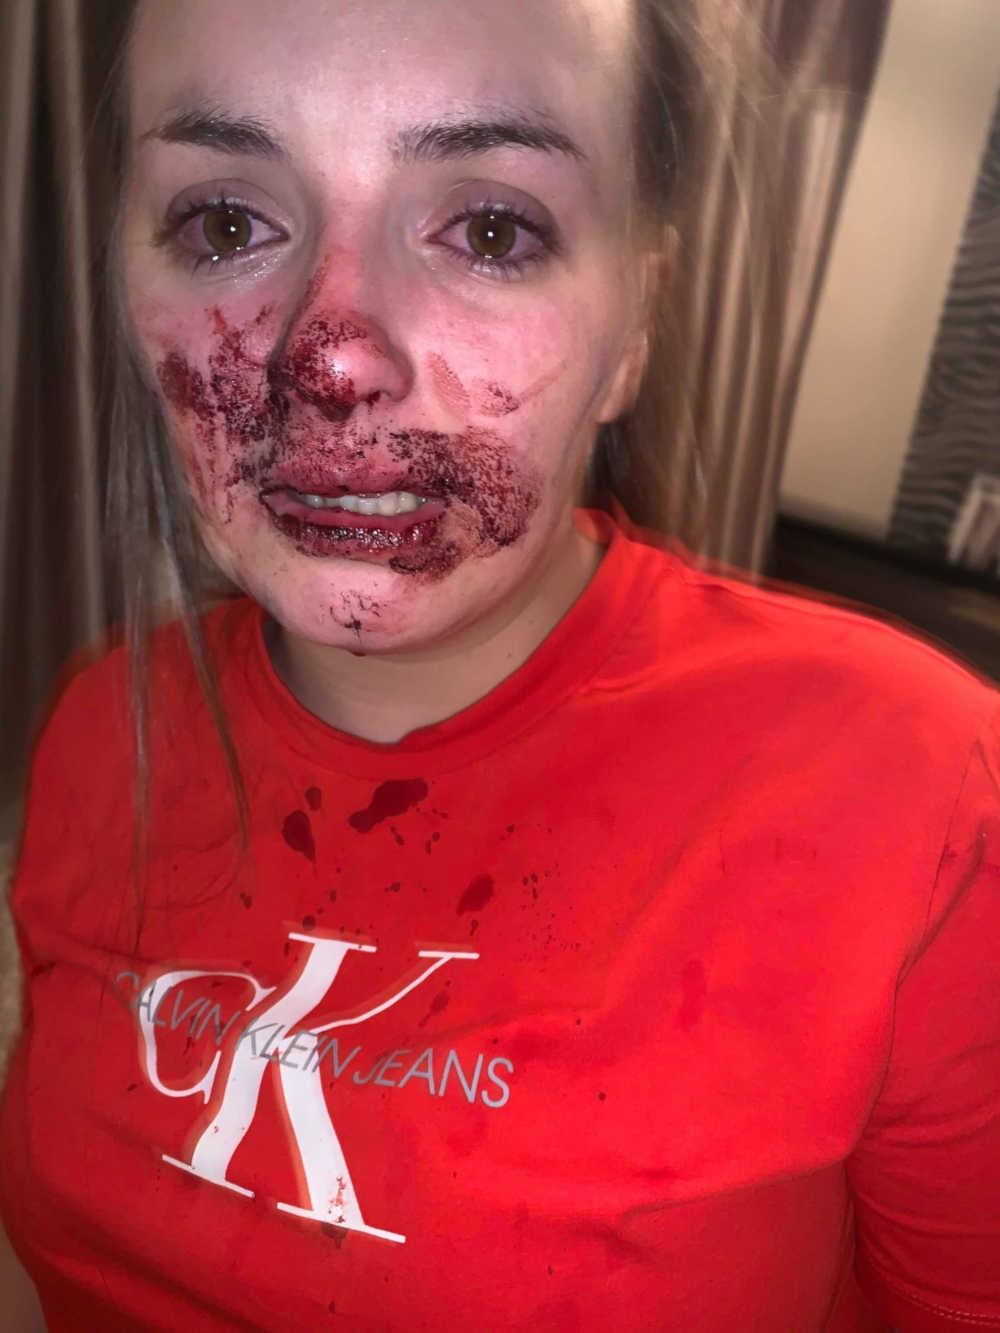 Brogan Shanley bloodied face